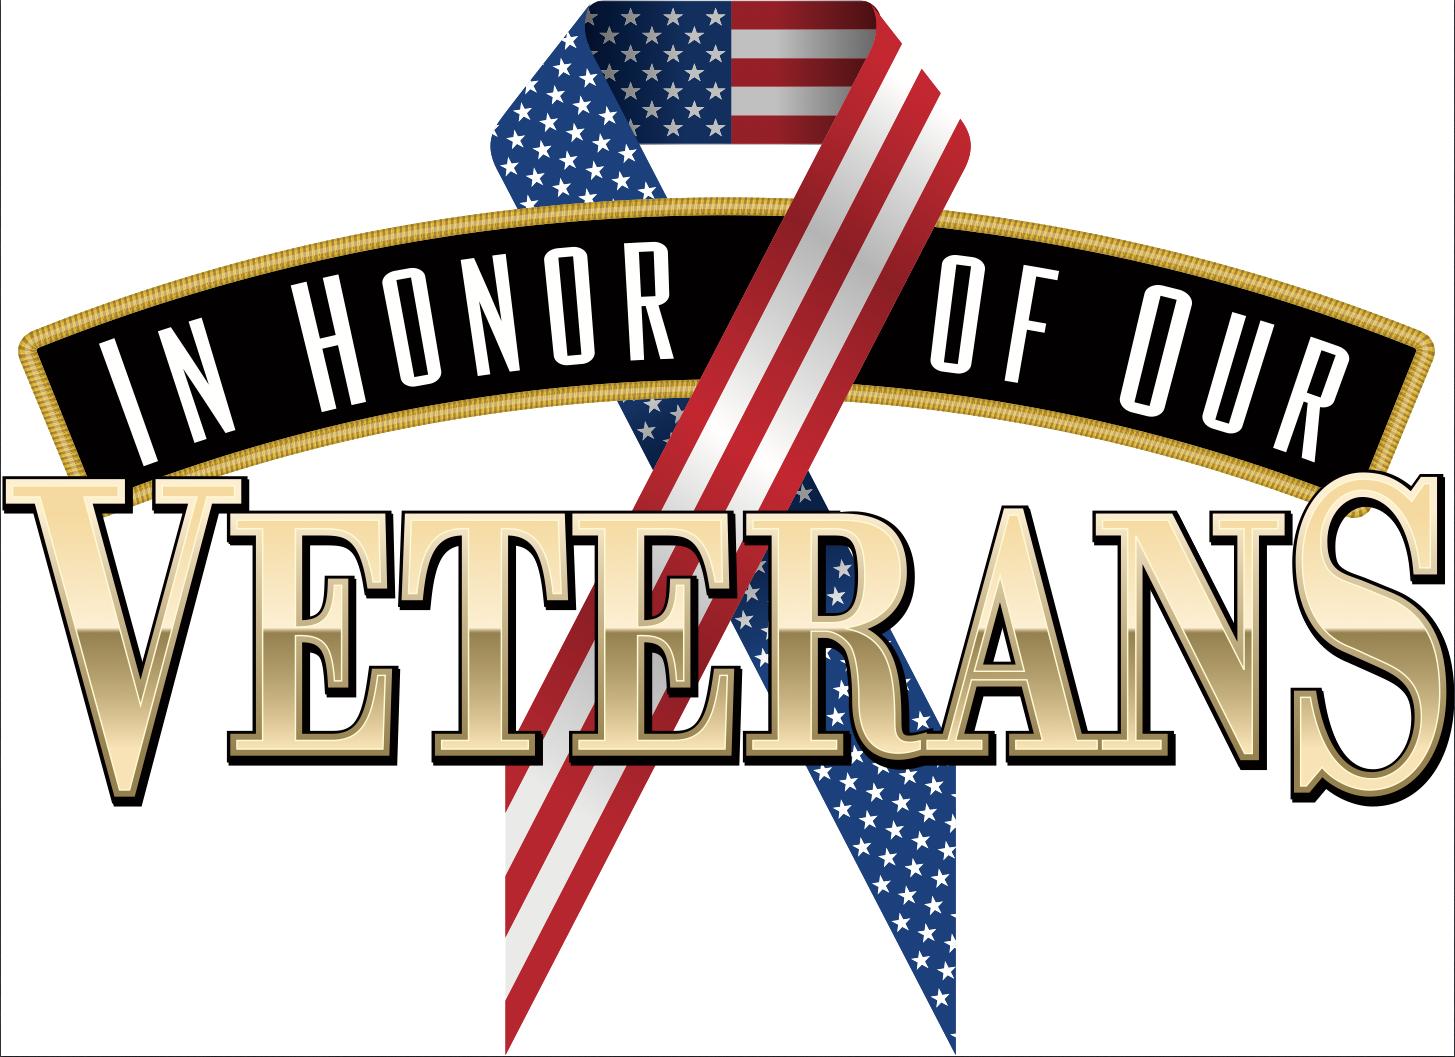 Veterans Helping Veterans Accomplish Their Goals And Dreams | Veterans day  quotes, Veterans day images, Memorial day thank you